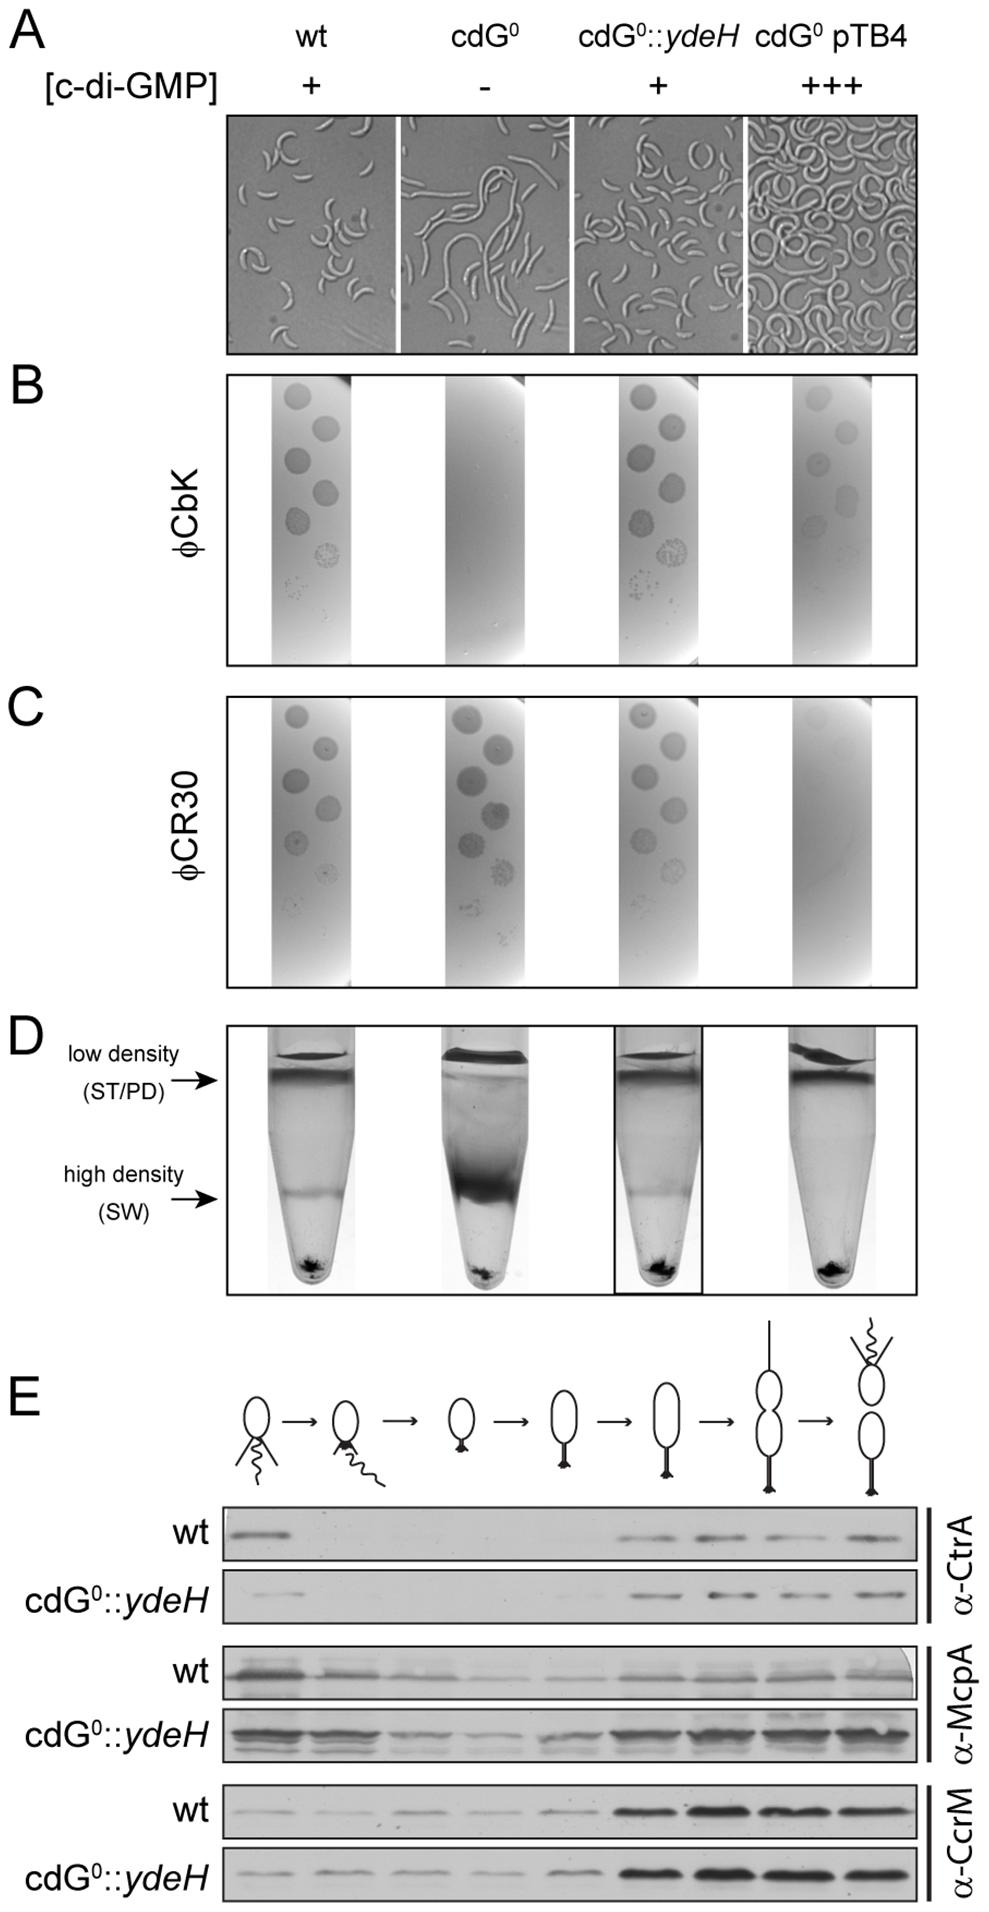 <i>In vivo</i> dose-response curves for c-di-GMP dependent processes.